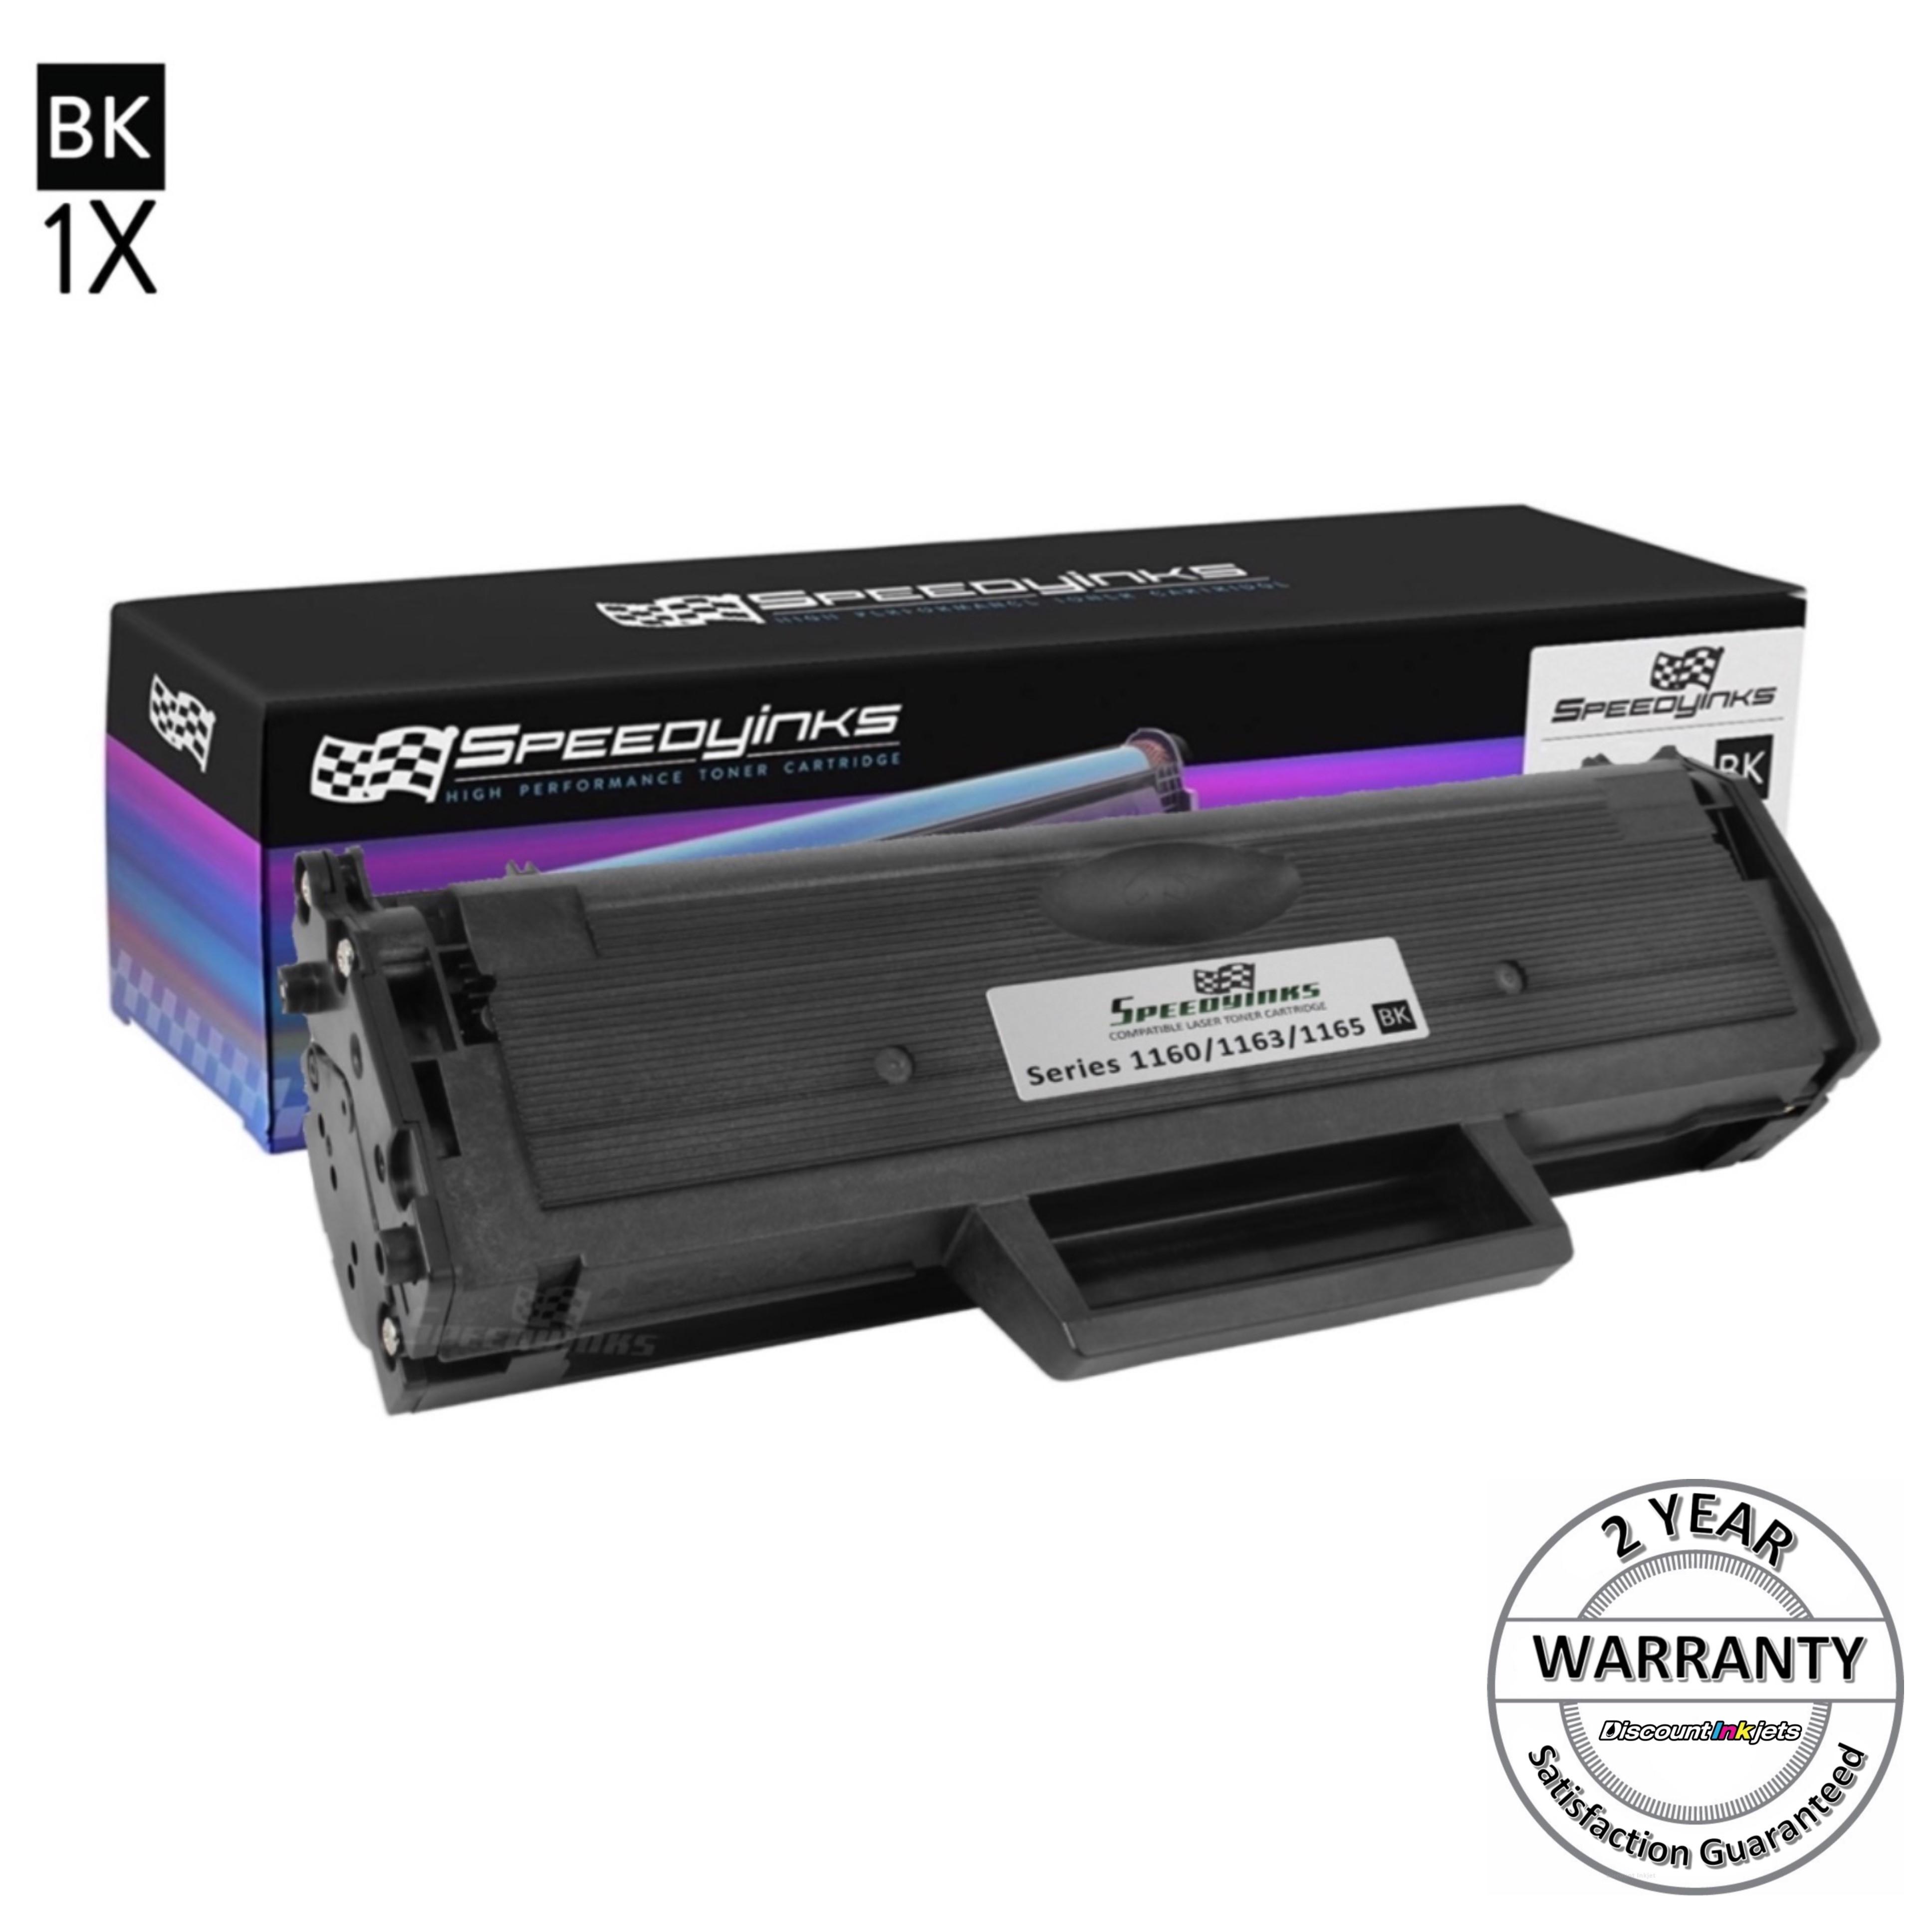 2pk black Ink toner cartridge for Dell B1160w 331-7335 HF442 YK1PM Laser Printer